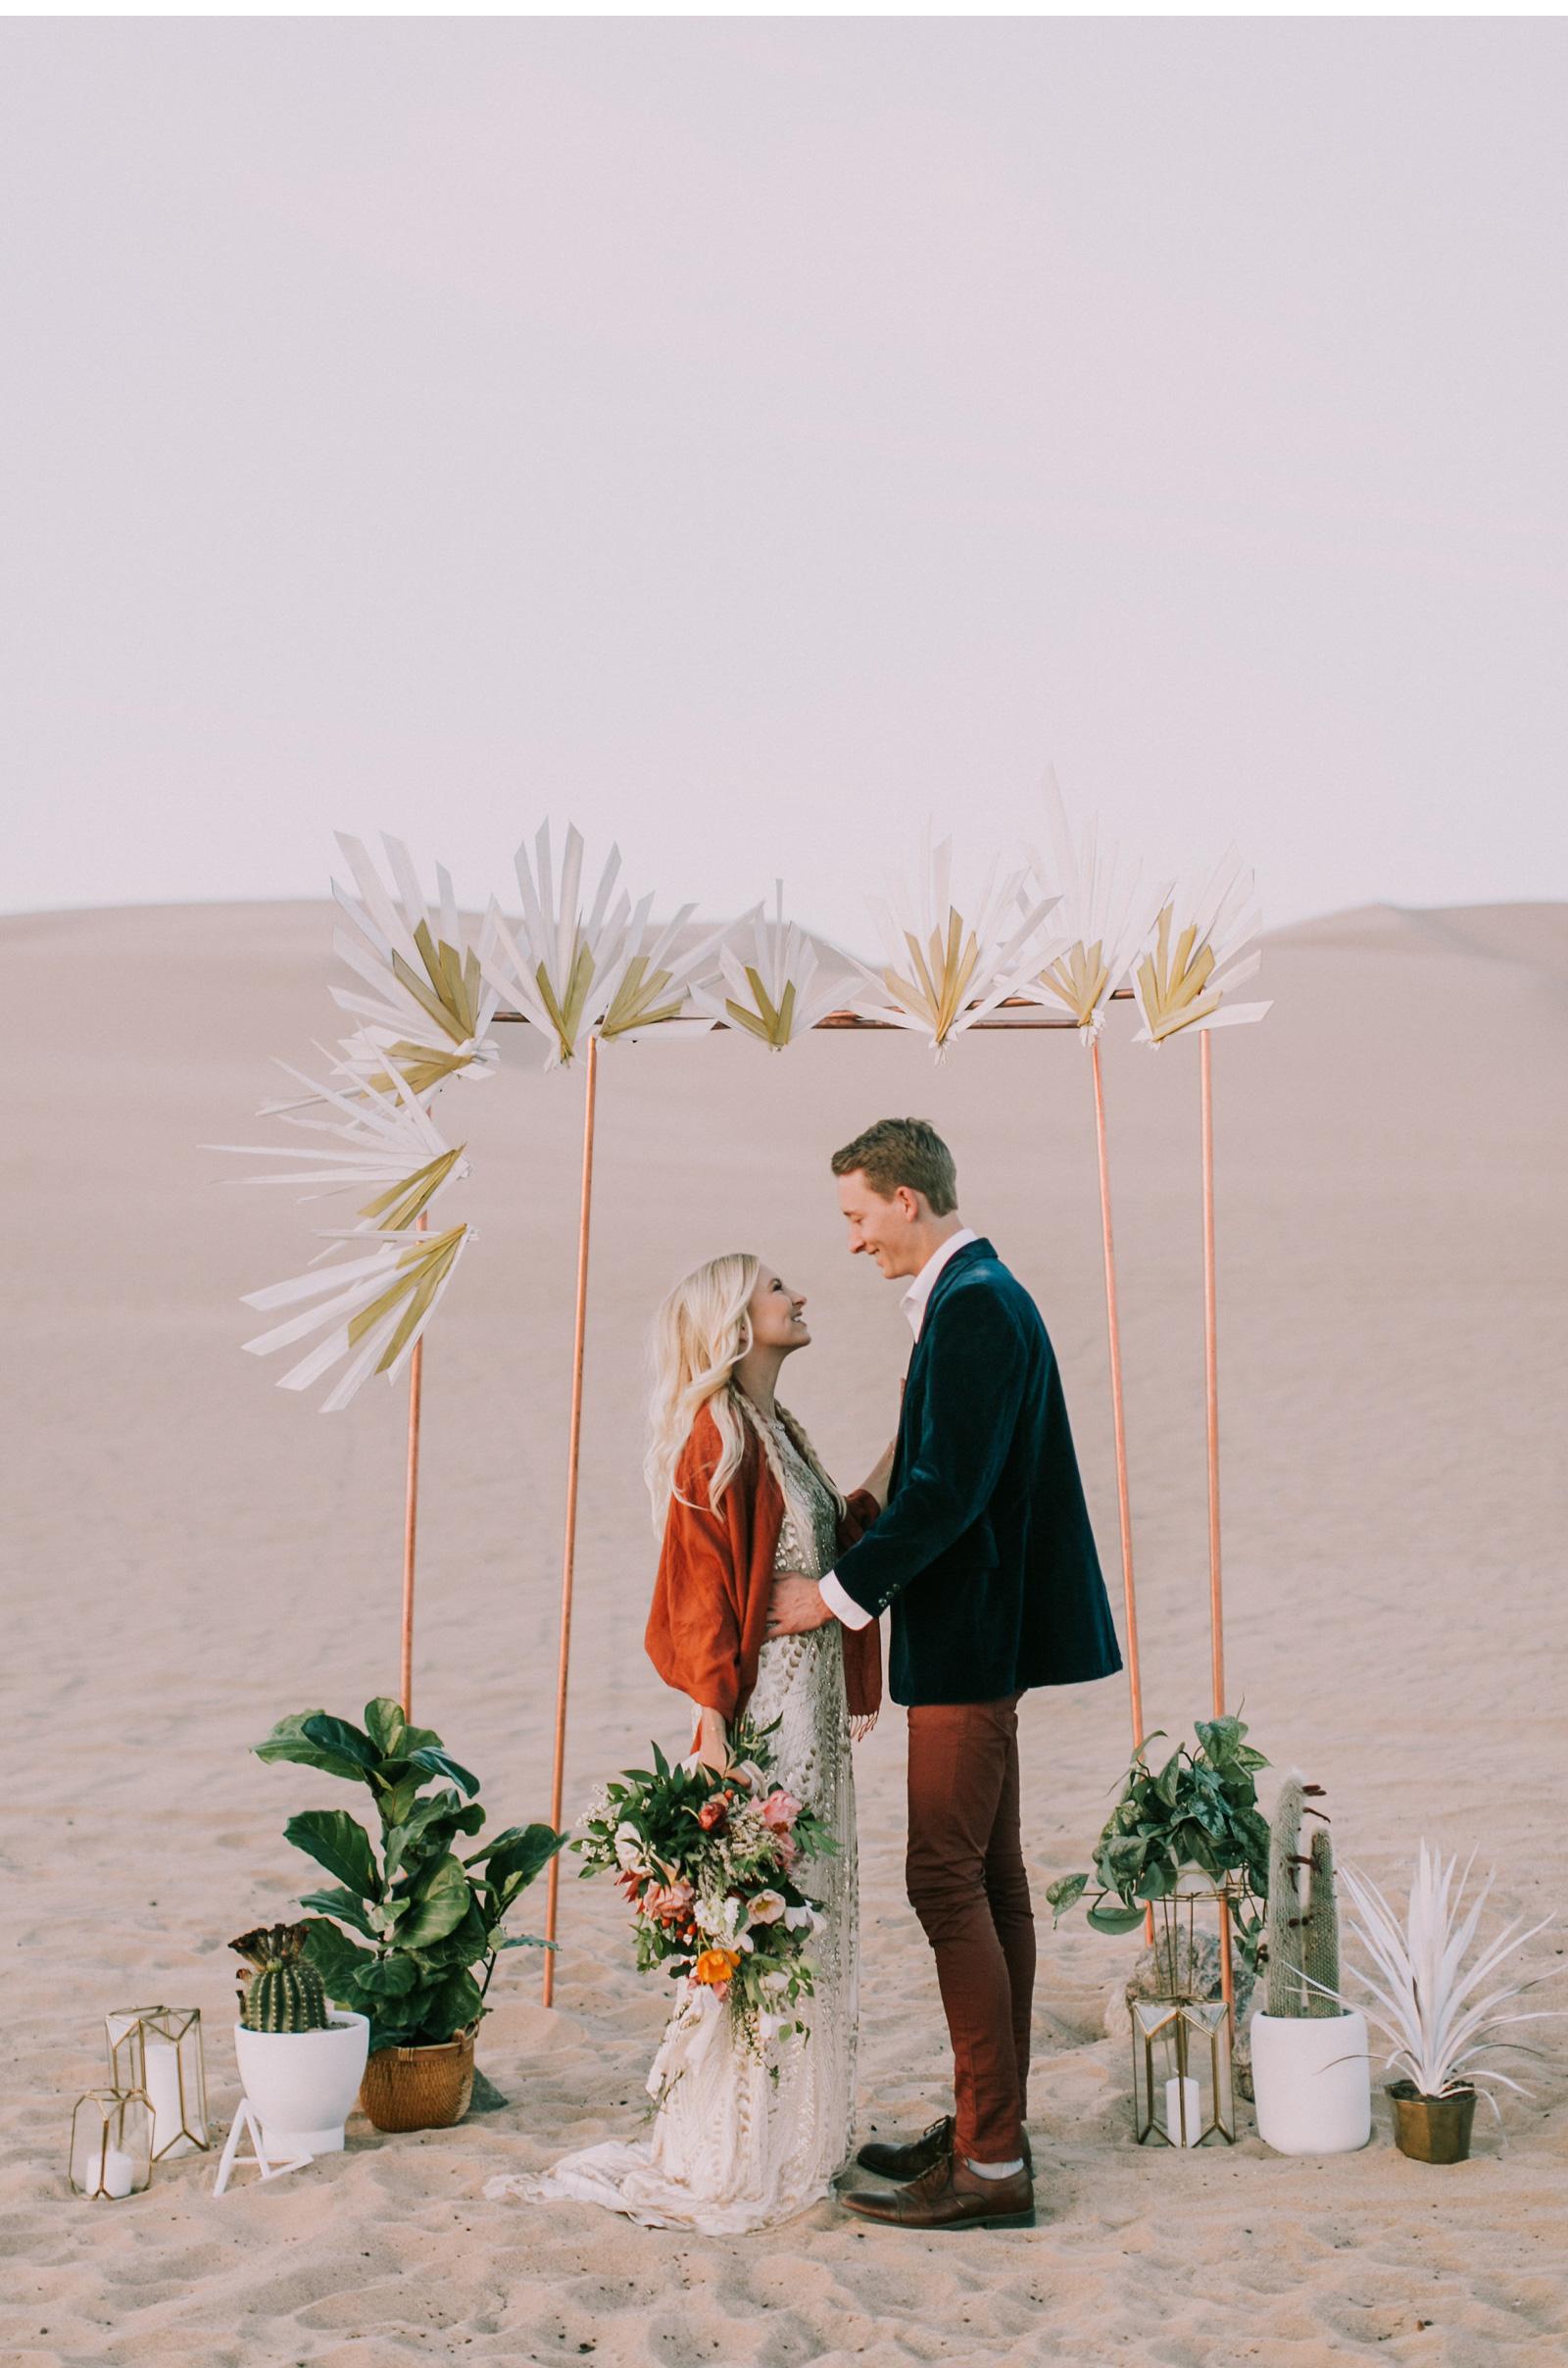 Desert-Wedding-Free-People-Wedding-Natalie-Schutt-Photography_06.jpg